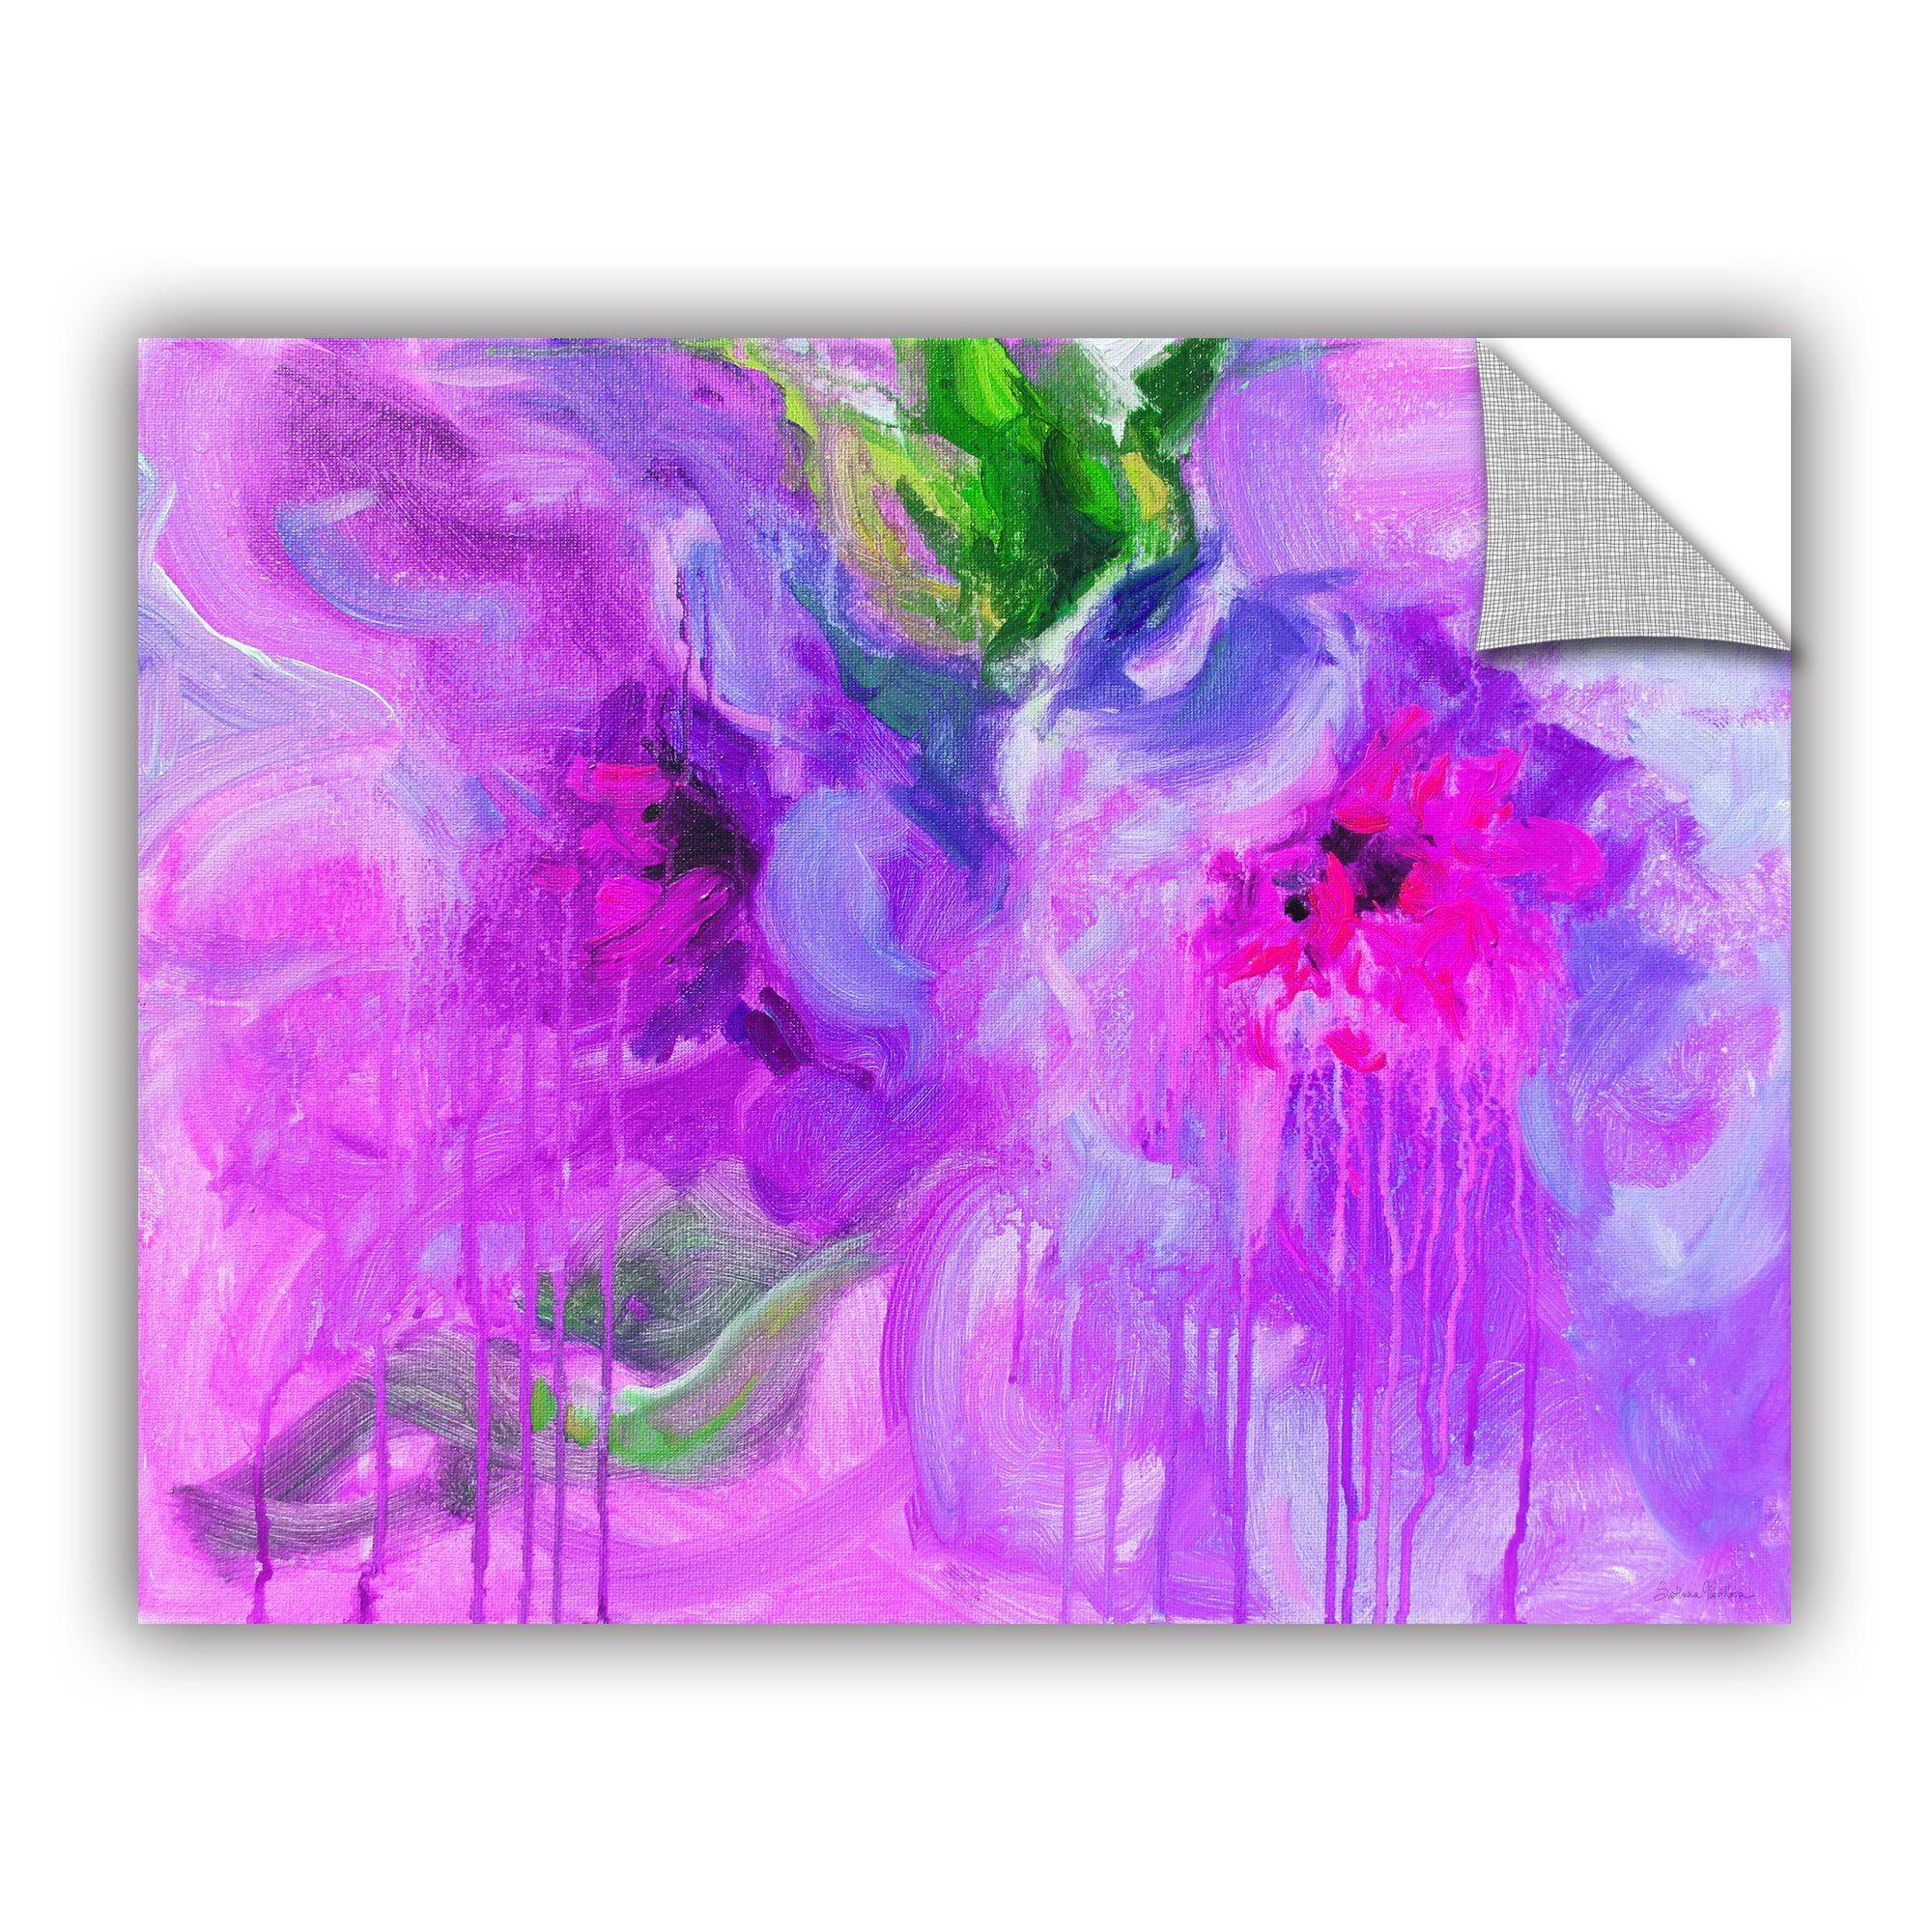 Removable wall art graphic - Artwall Svetlana Novikova Purple Pink Flowers Art Appealz Removable Wall Art By Artwall